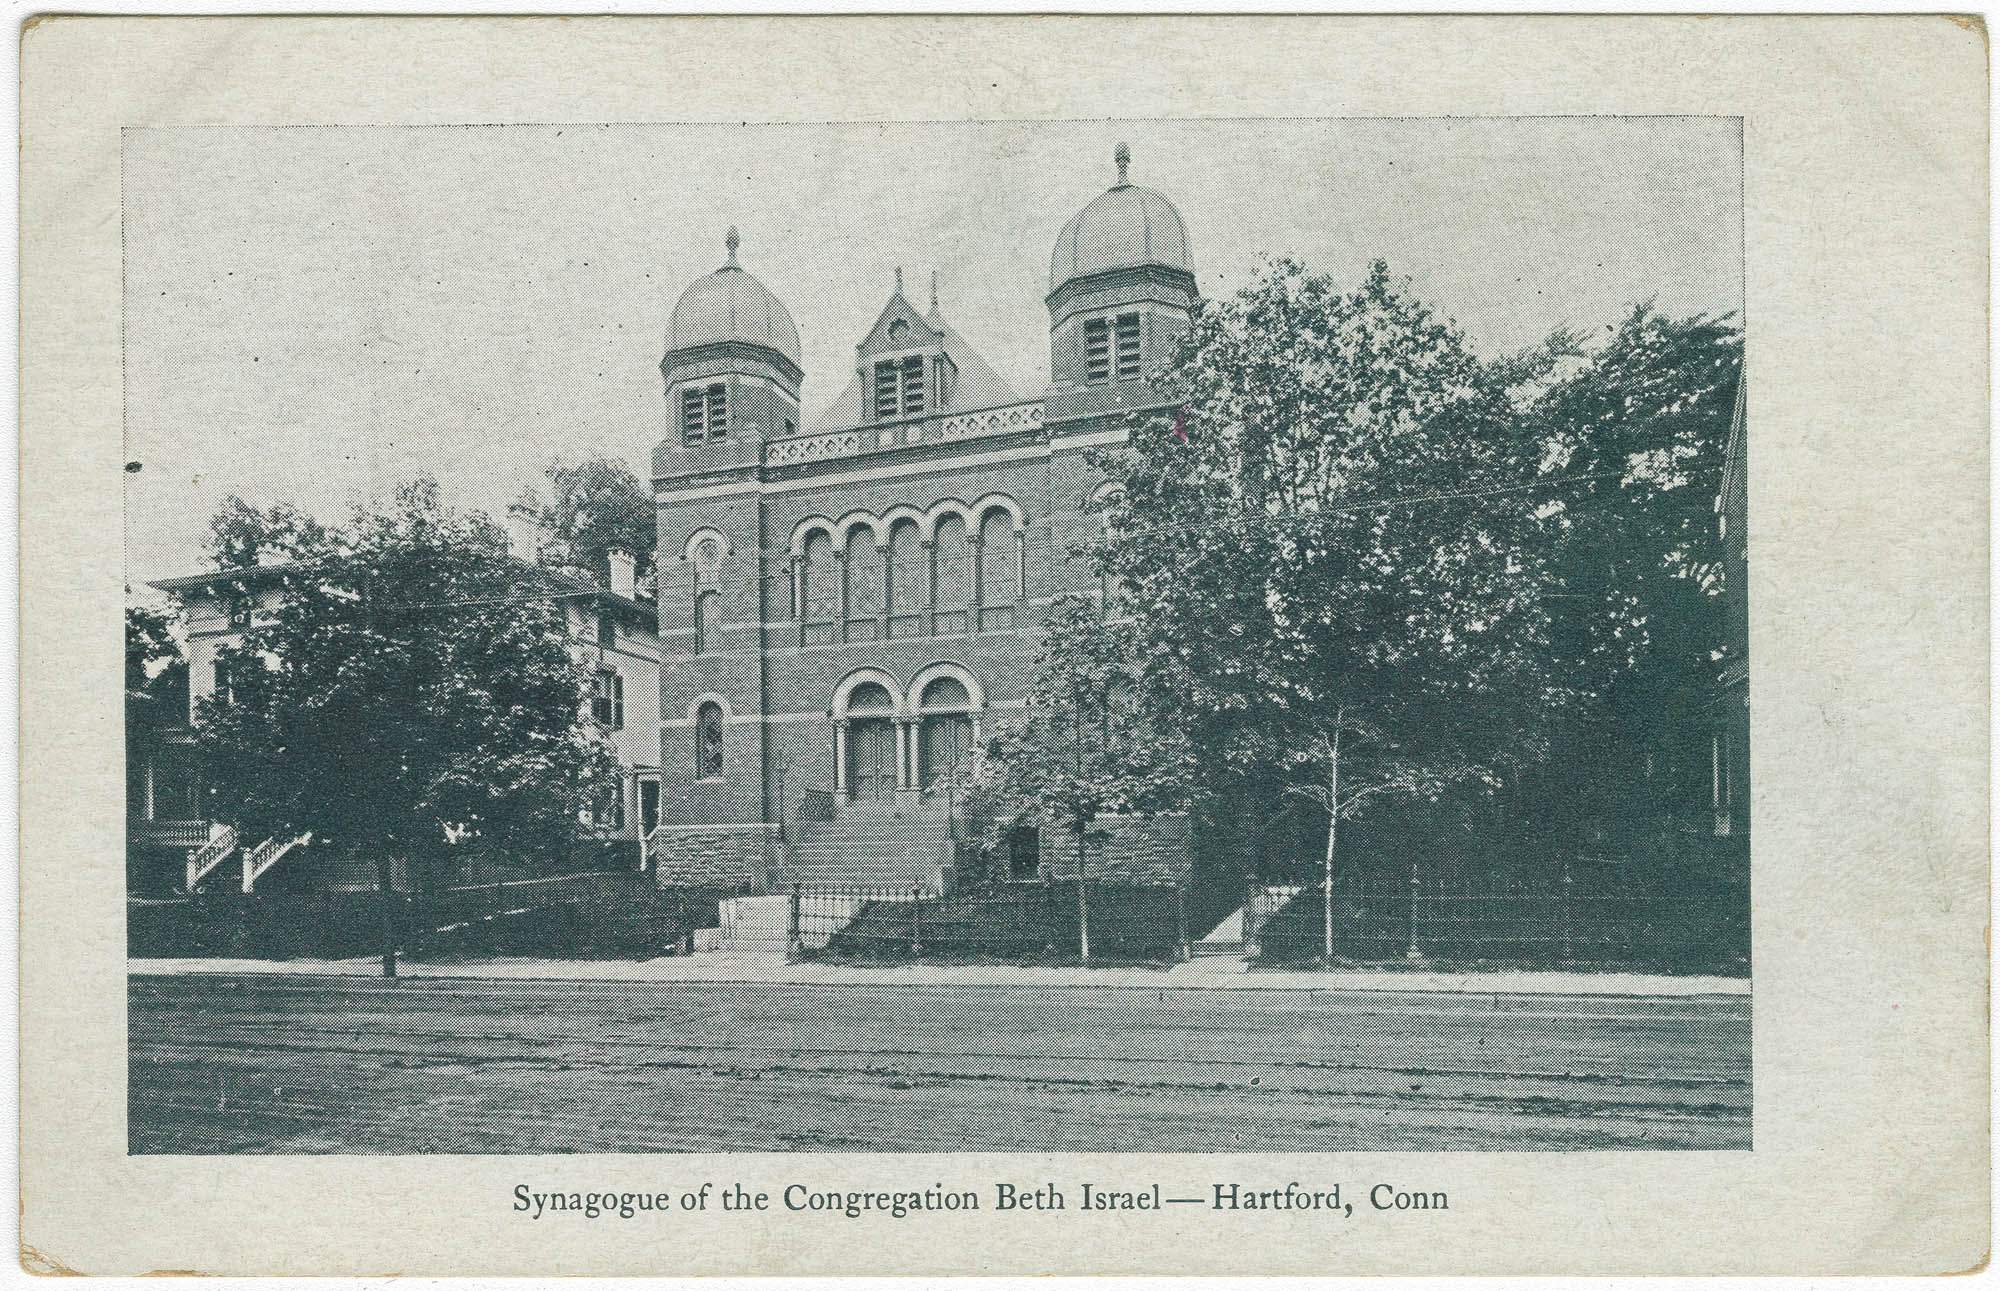 Synagogue of the Congregation Beth Israel - Hartford, Conn